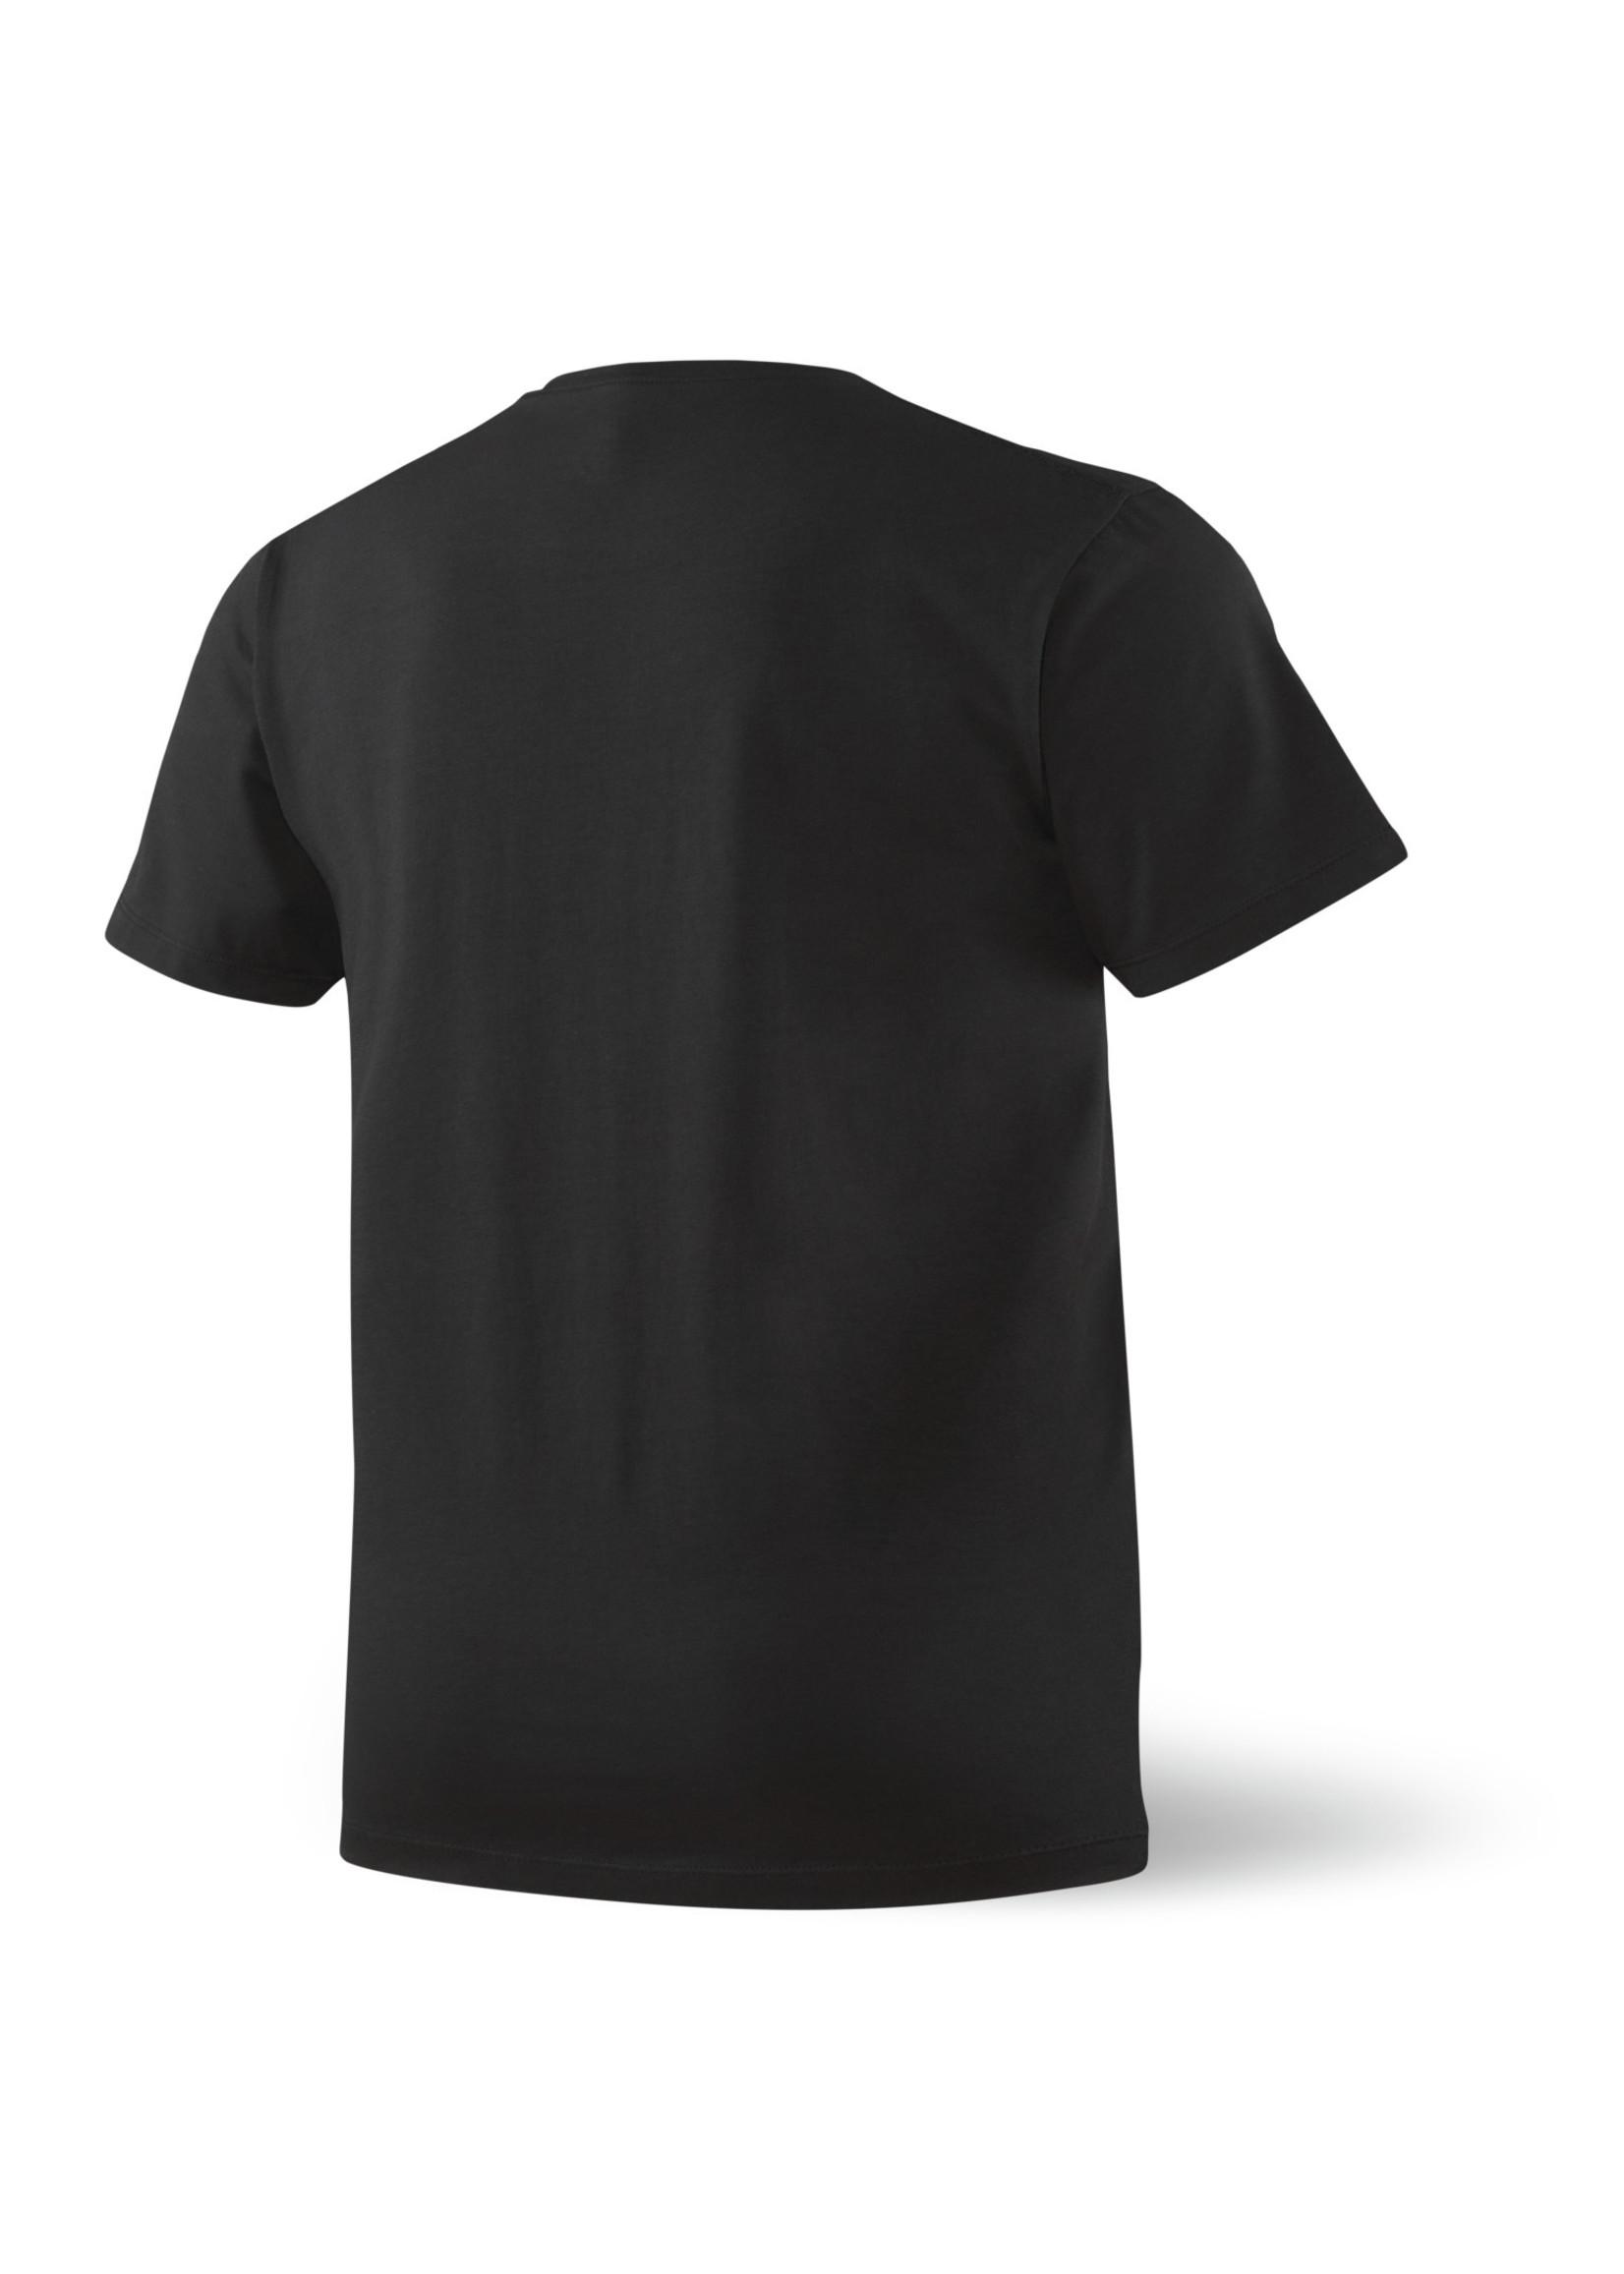 SAXX SAXX's Short Sleeve Crew Undershirt